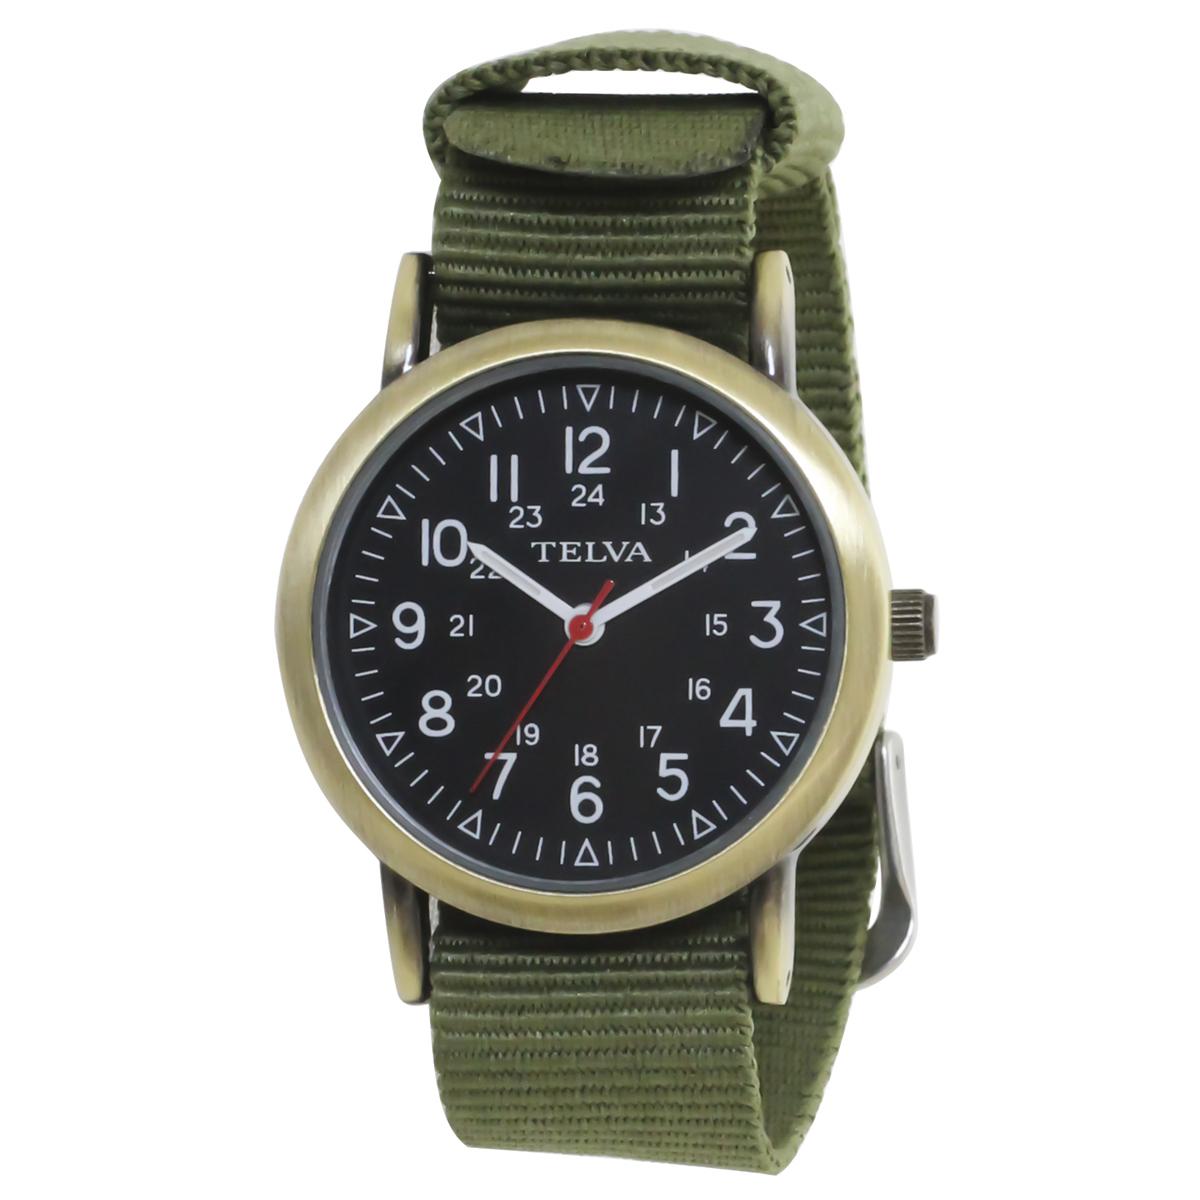 TELVA テルバ アナログウオッチ NATOバンド メンズ レディース 腕時計【TE-AM043】